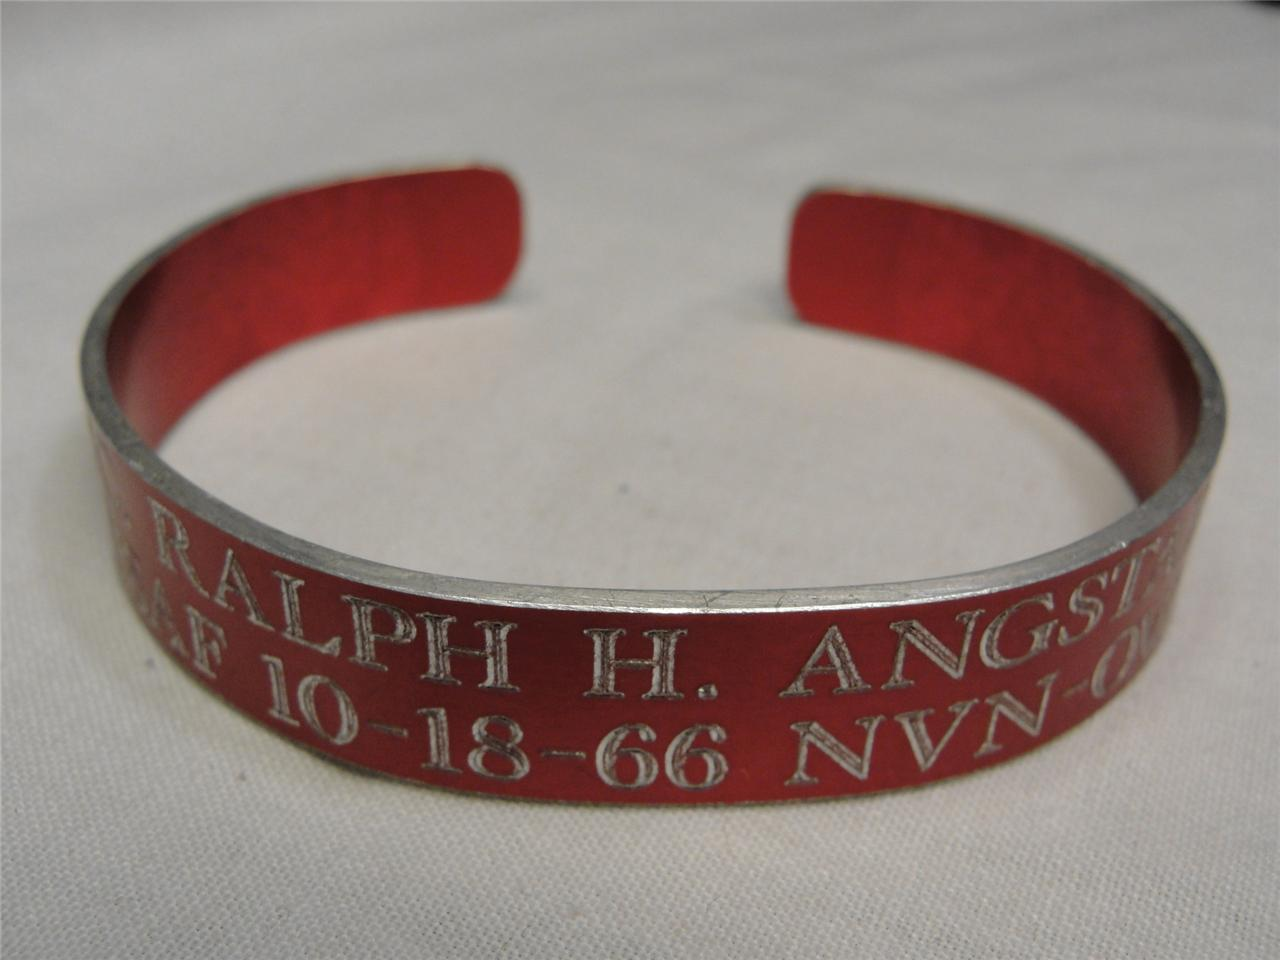 era us air pow bracelet ltc ralph h